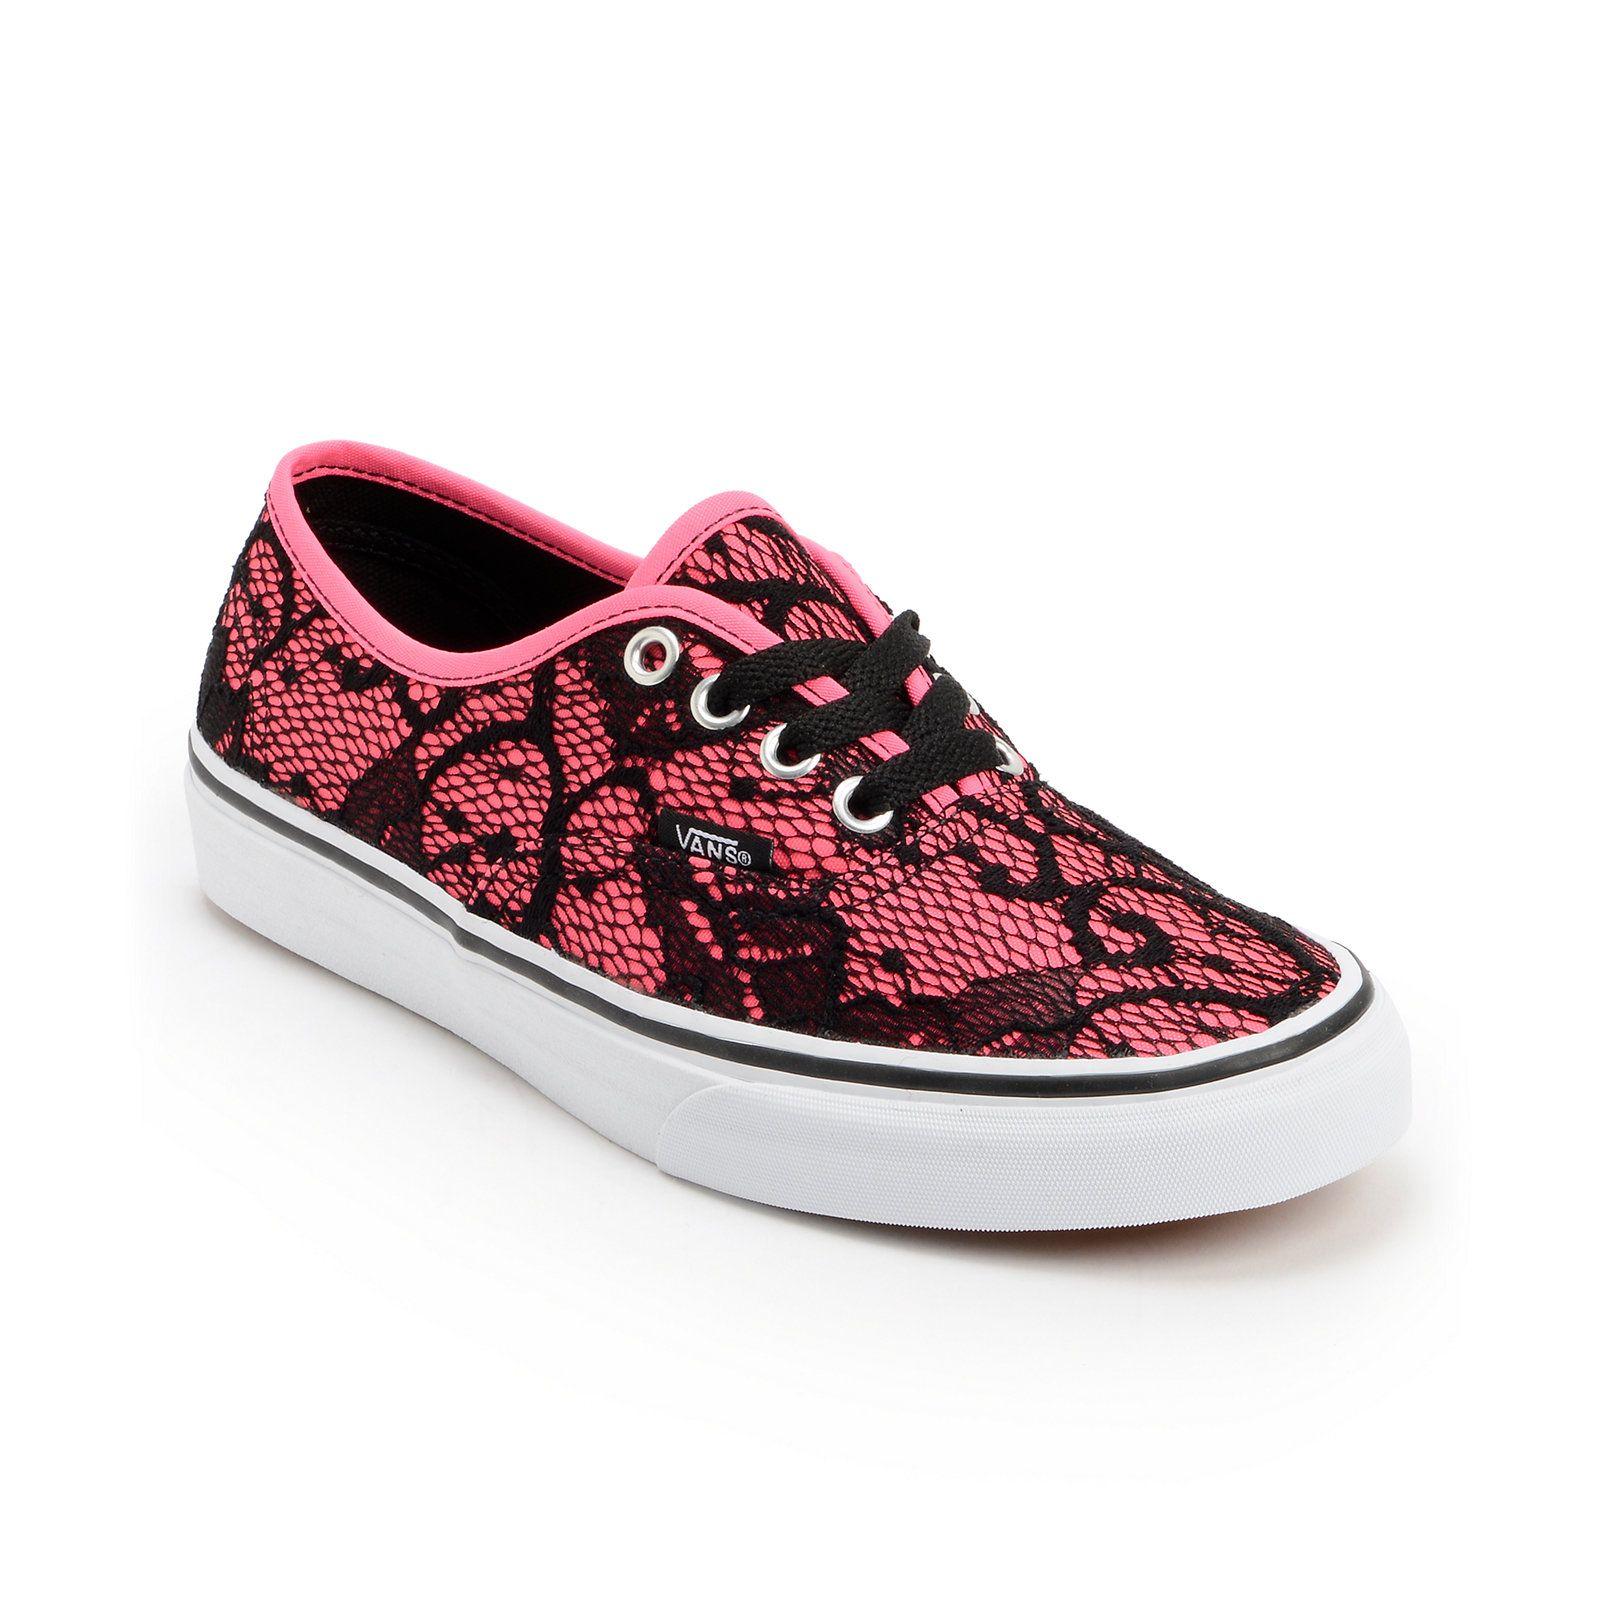 Filles Chaussures Vans Trainers Vans Girls Authentic